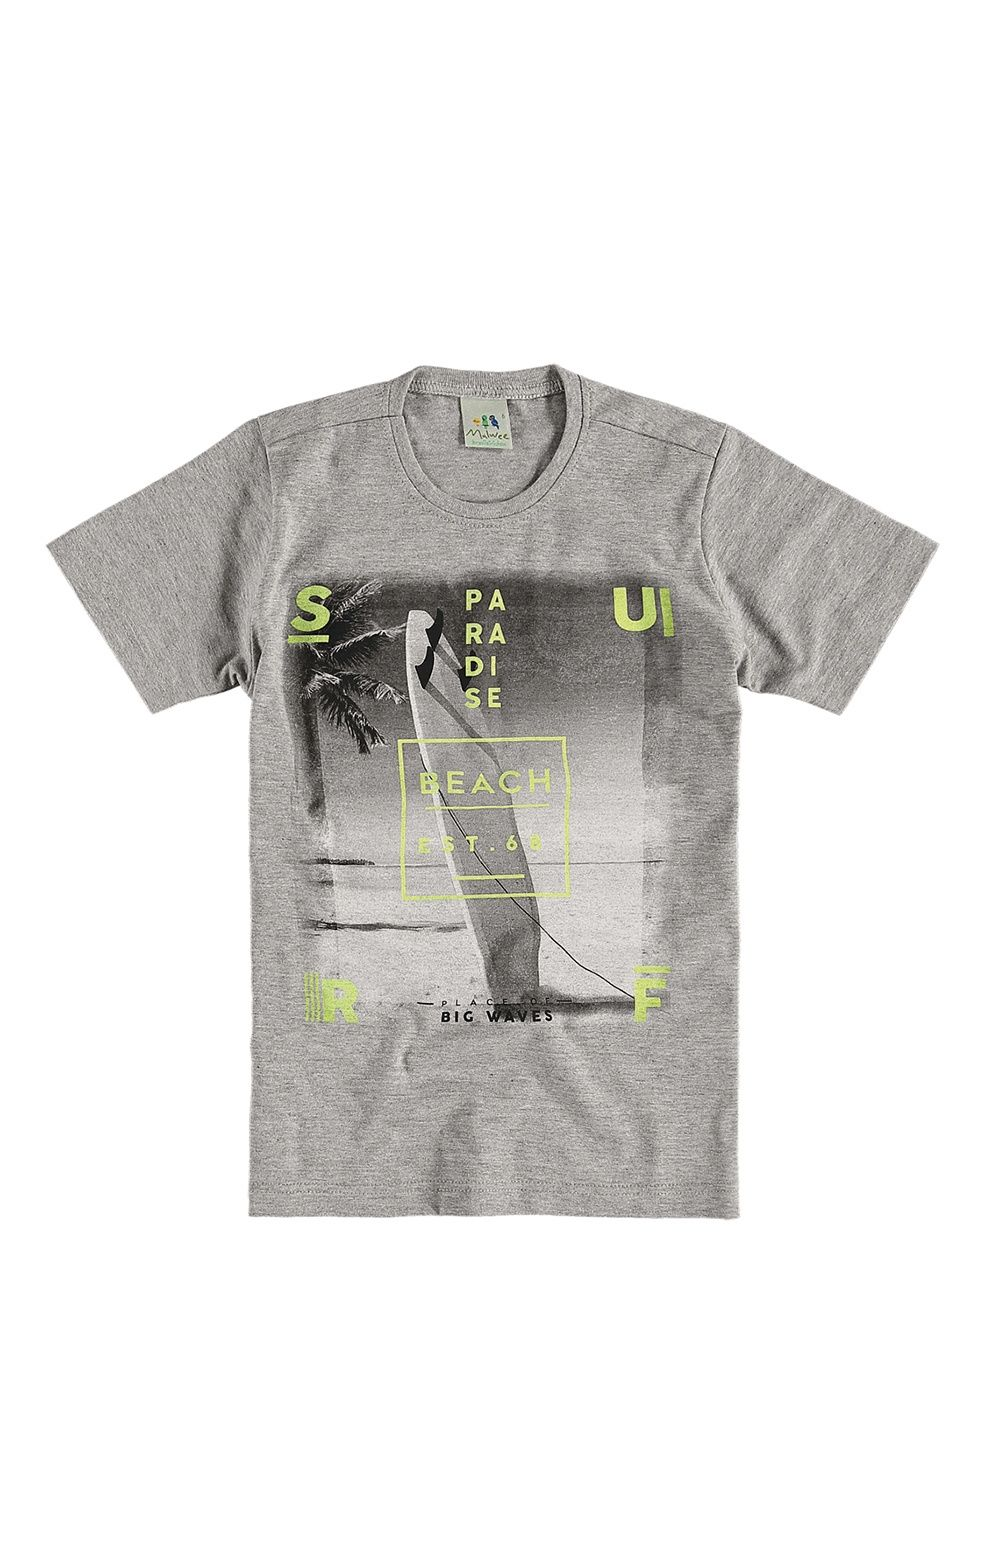 Pin de Netosamuellyra em T shirt Freesurf   Camisetas